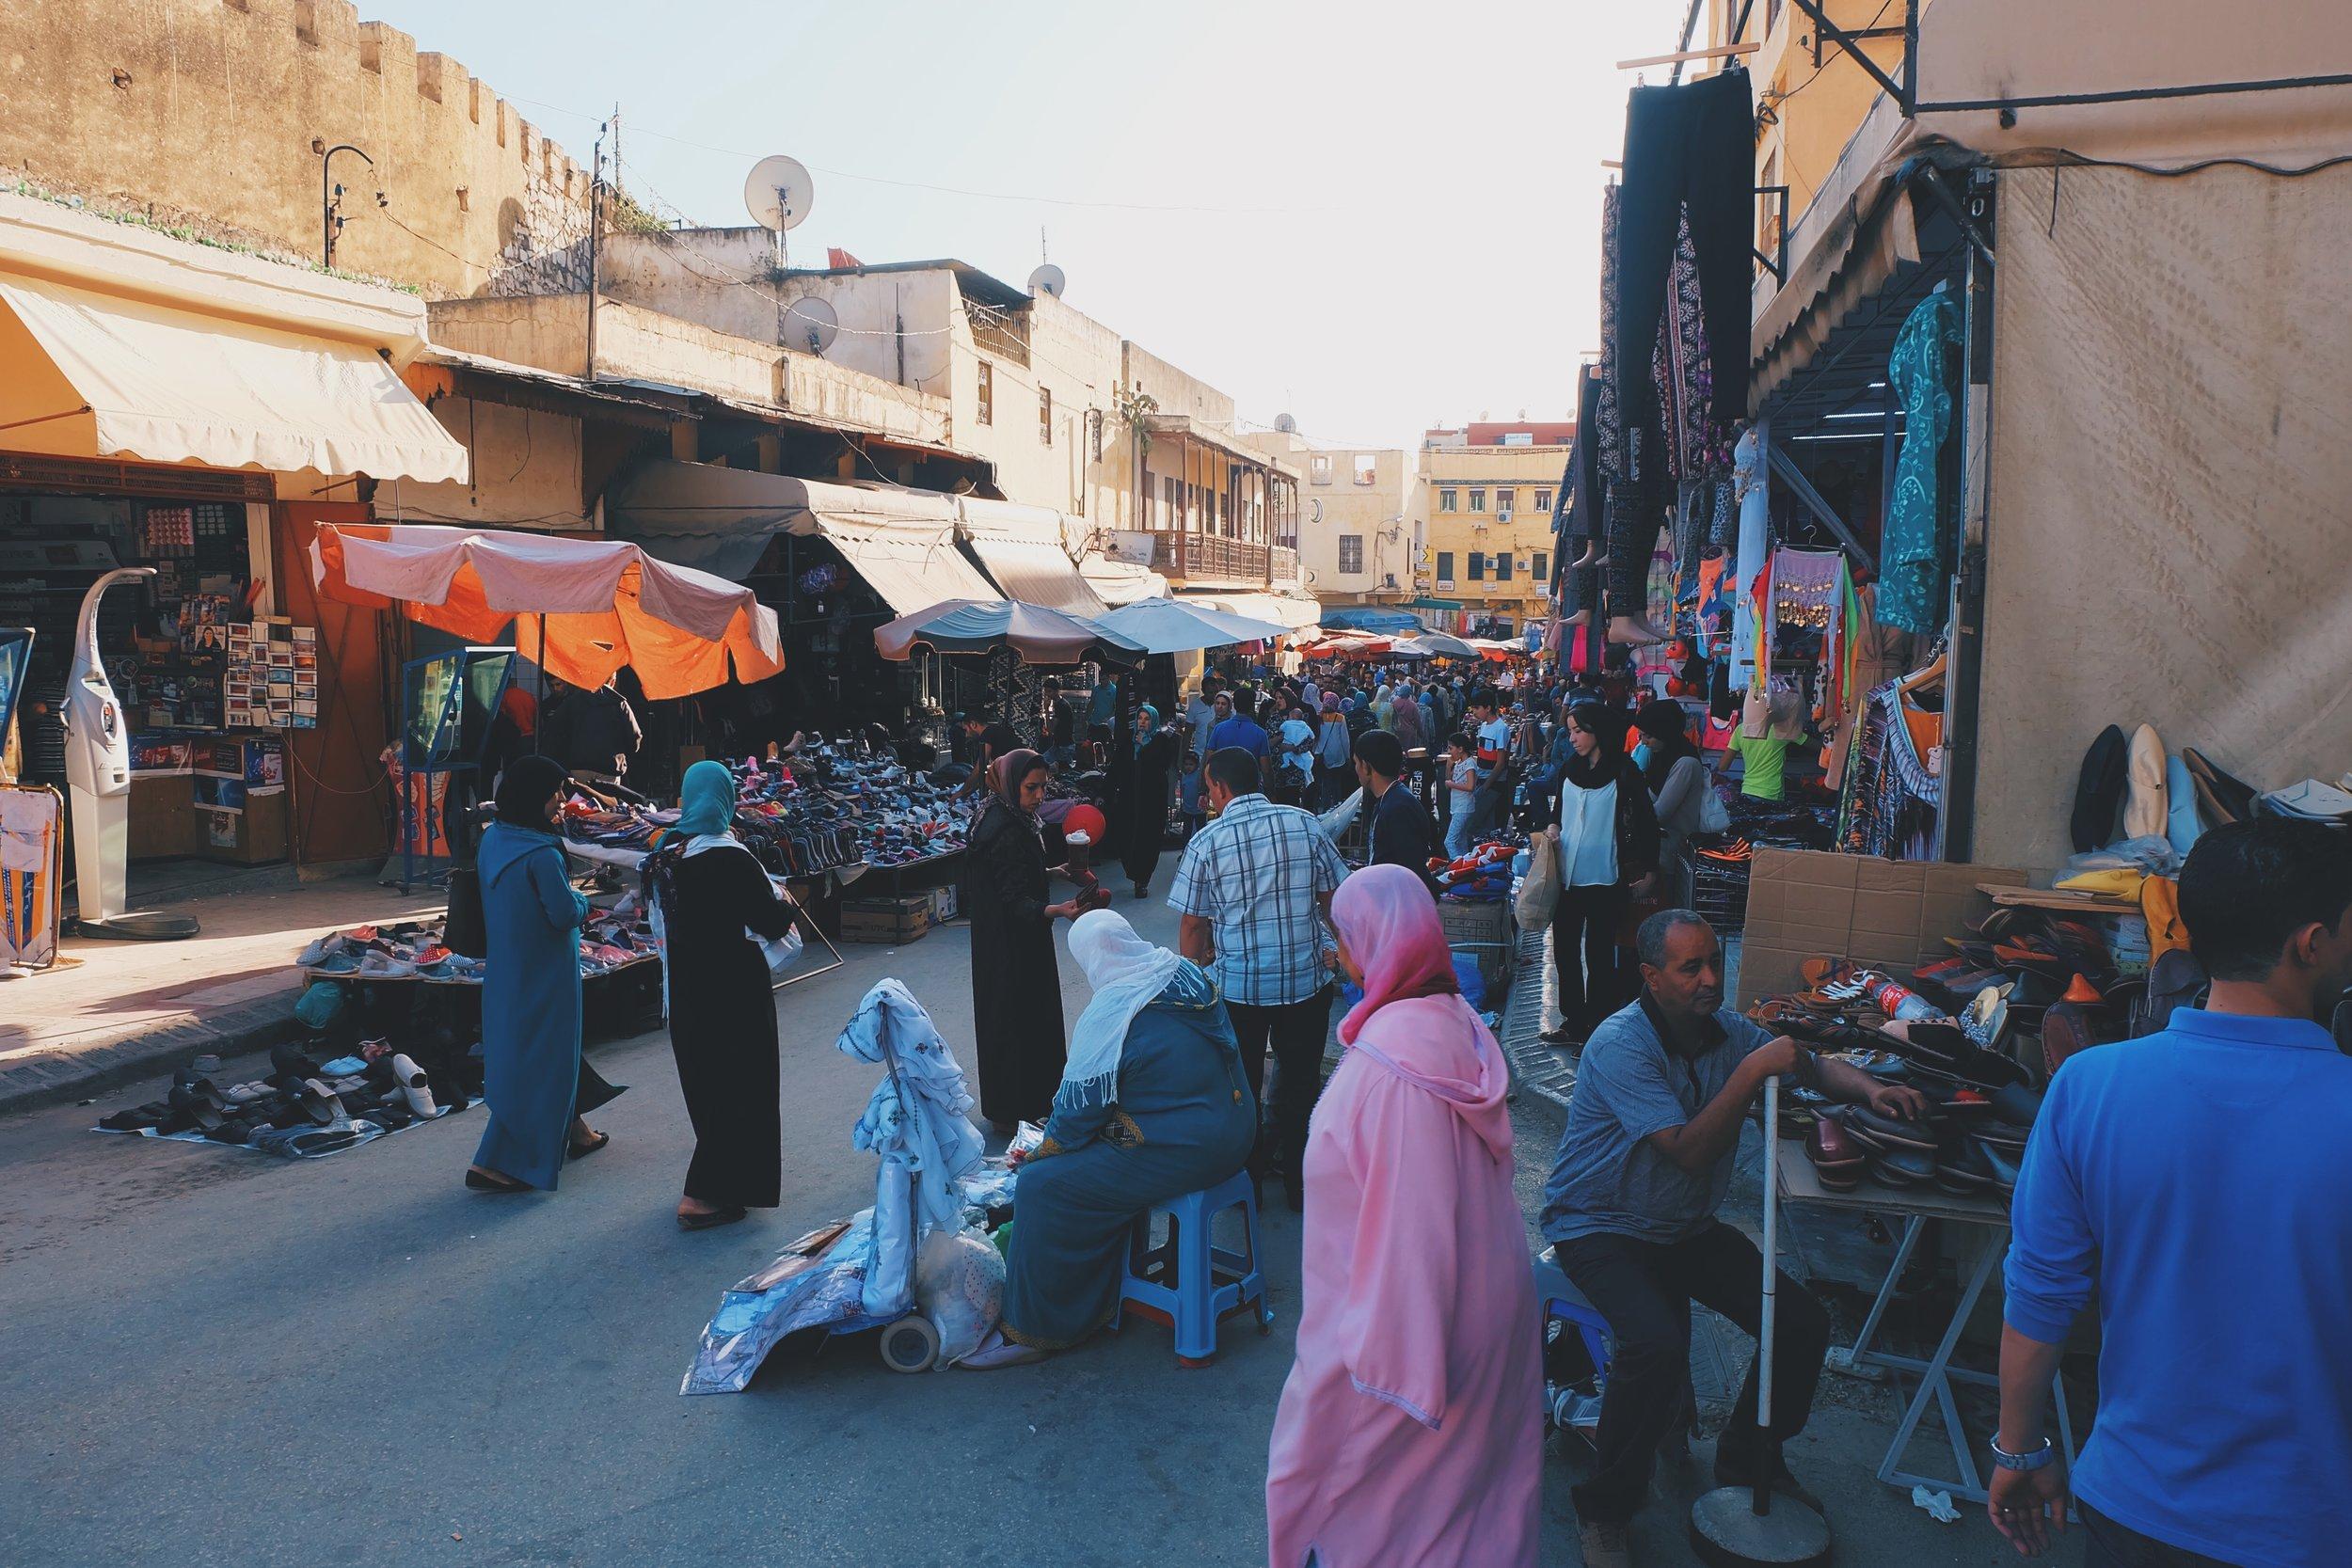 Market scene at Meknes